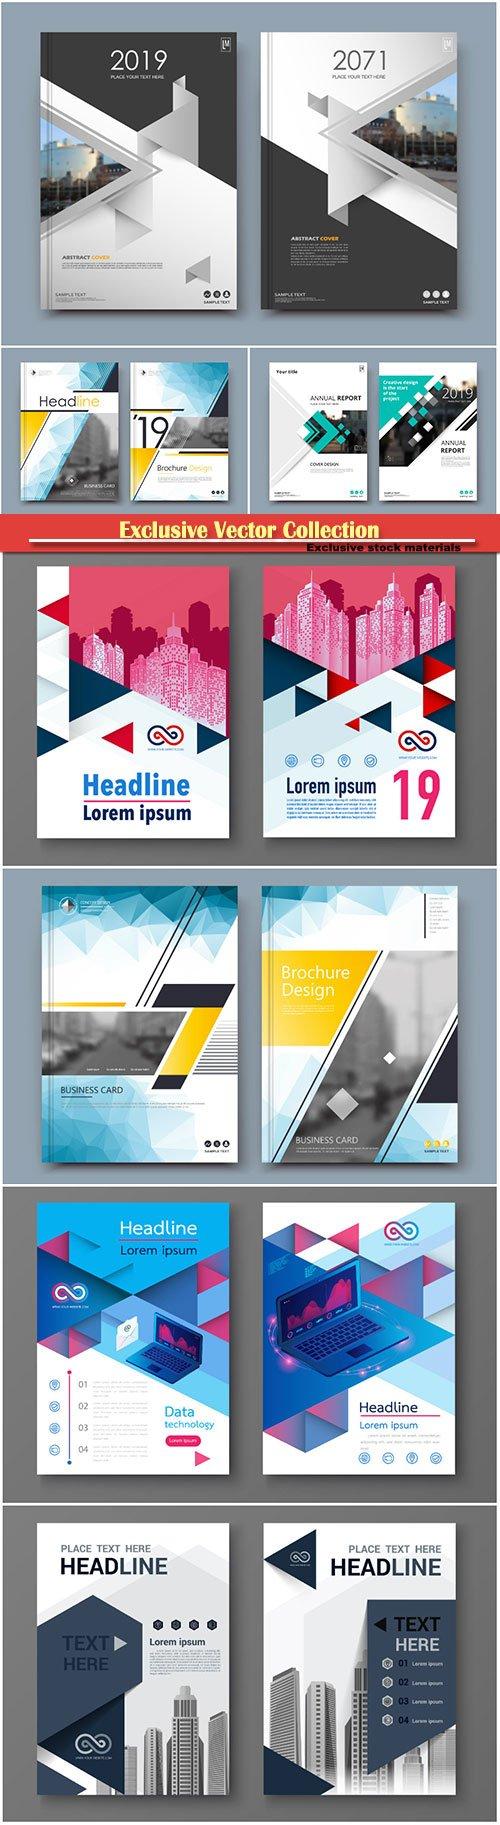 Brochure cover design vector template # 8